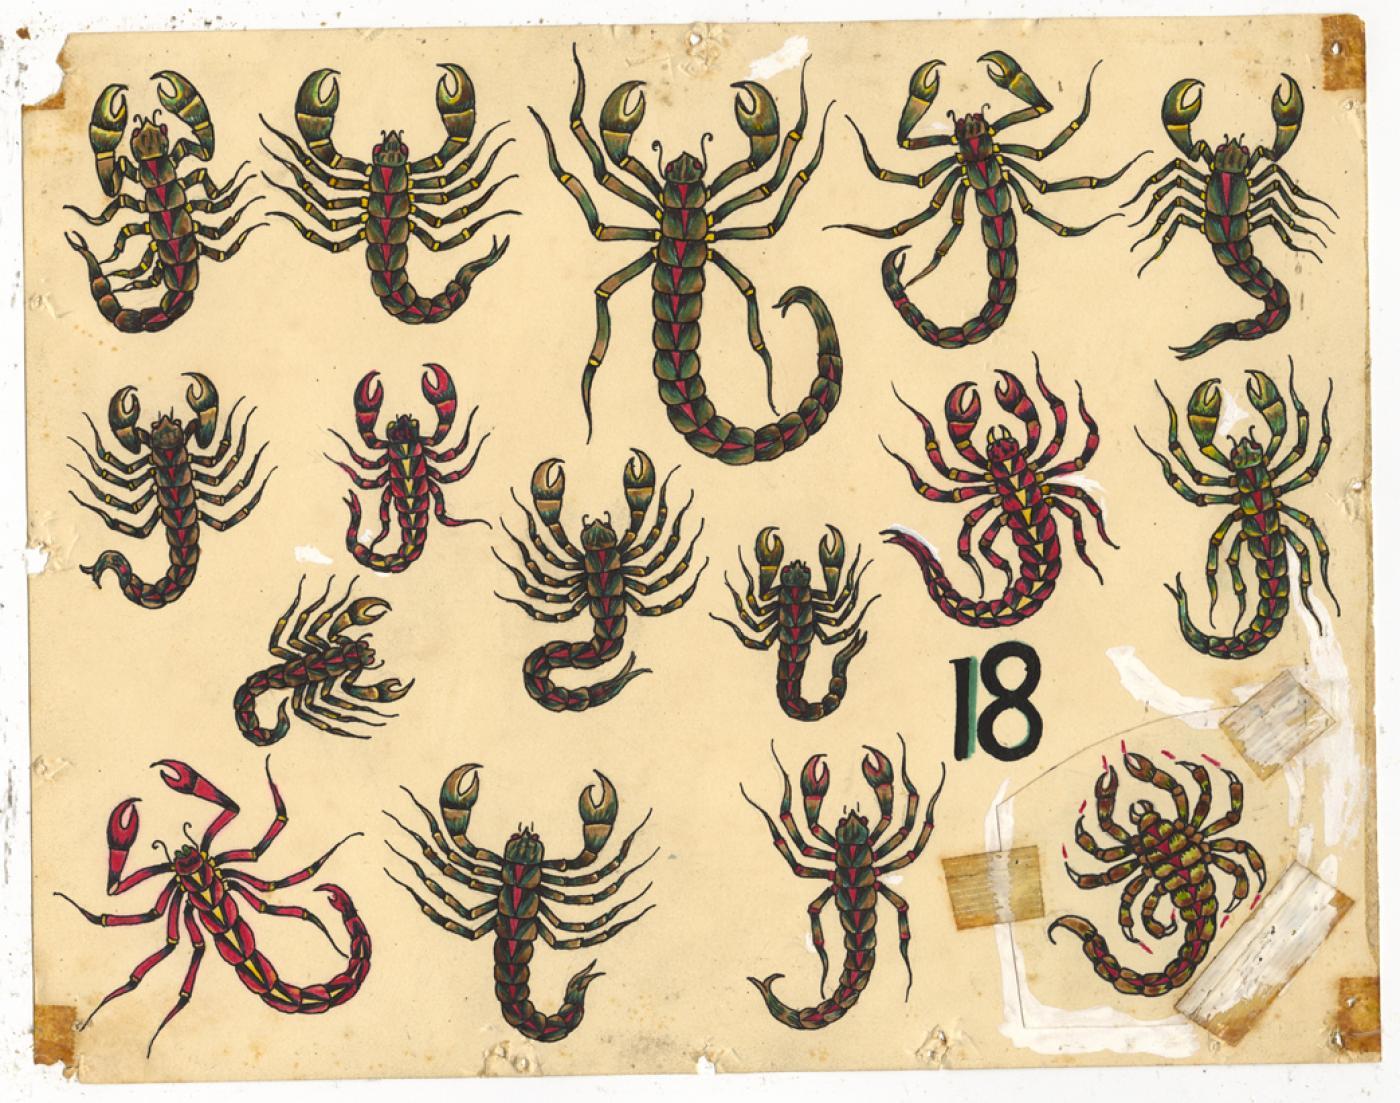 Rosie Camanga - Untitled (Scorpions)